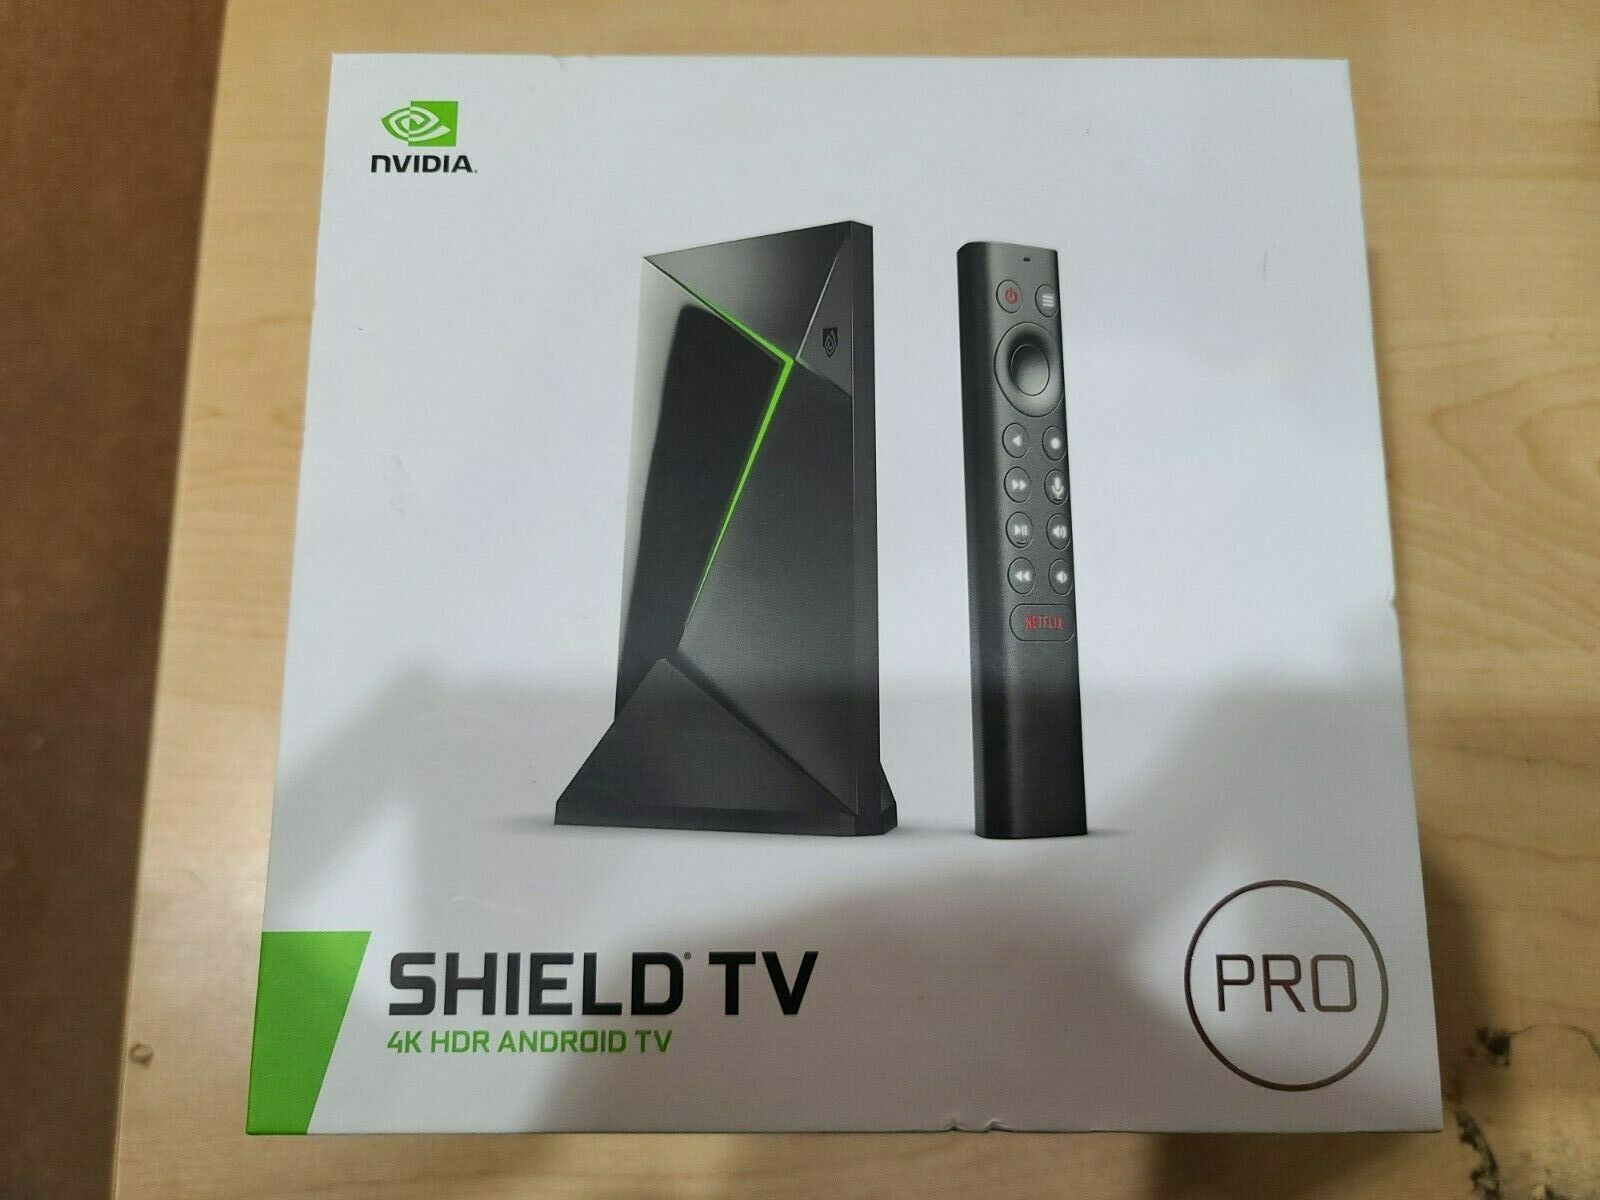 NVIDIA Shield TV Pro 4K UHD Streaming Media Player Unopened Brand New brand media new nvidia player pro shield streaming uhd unopened